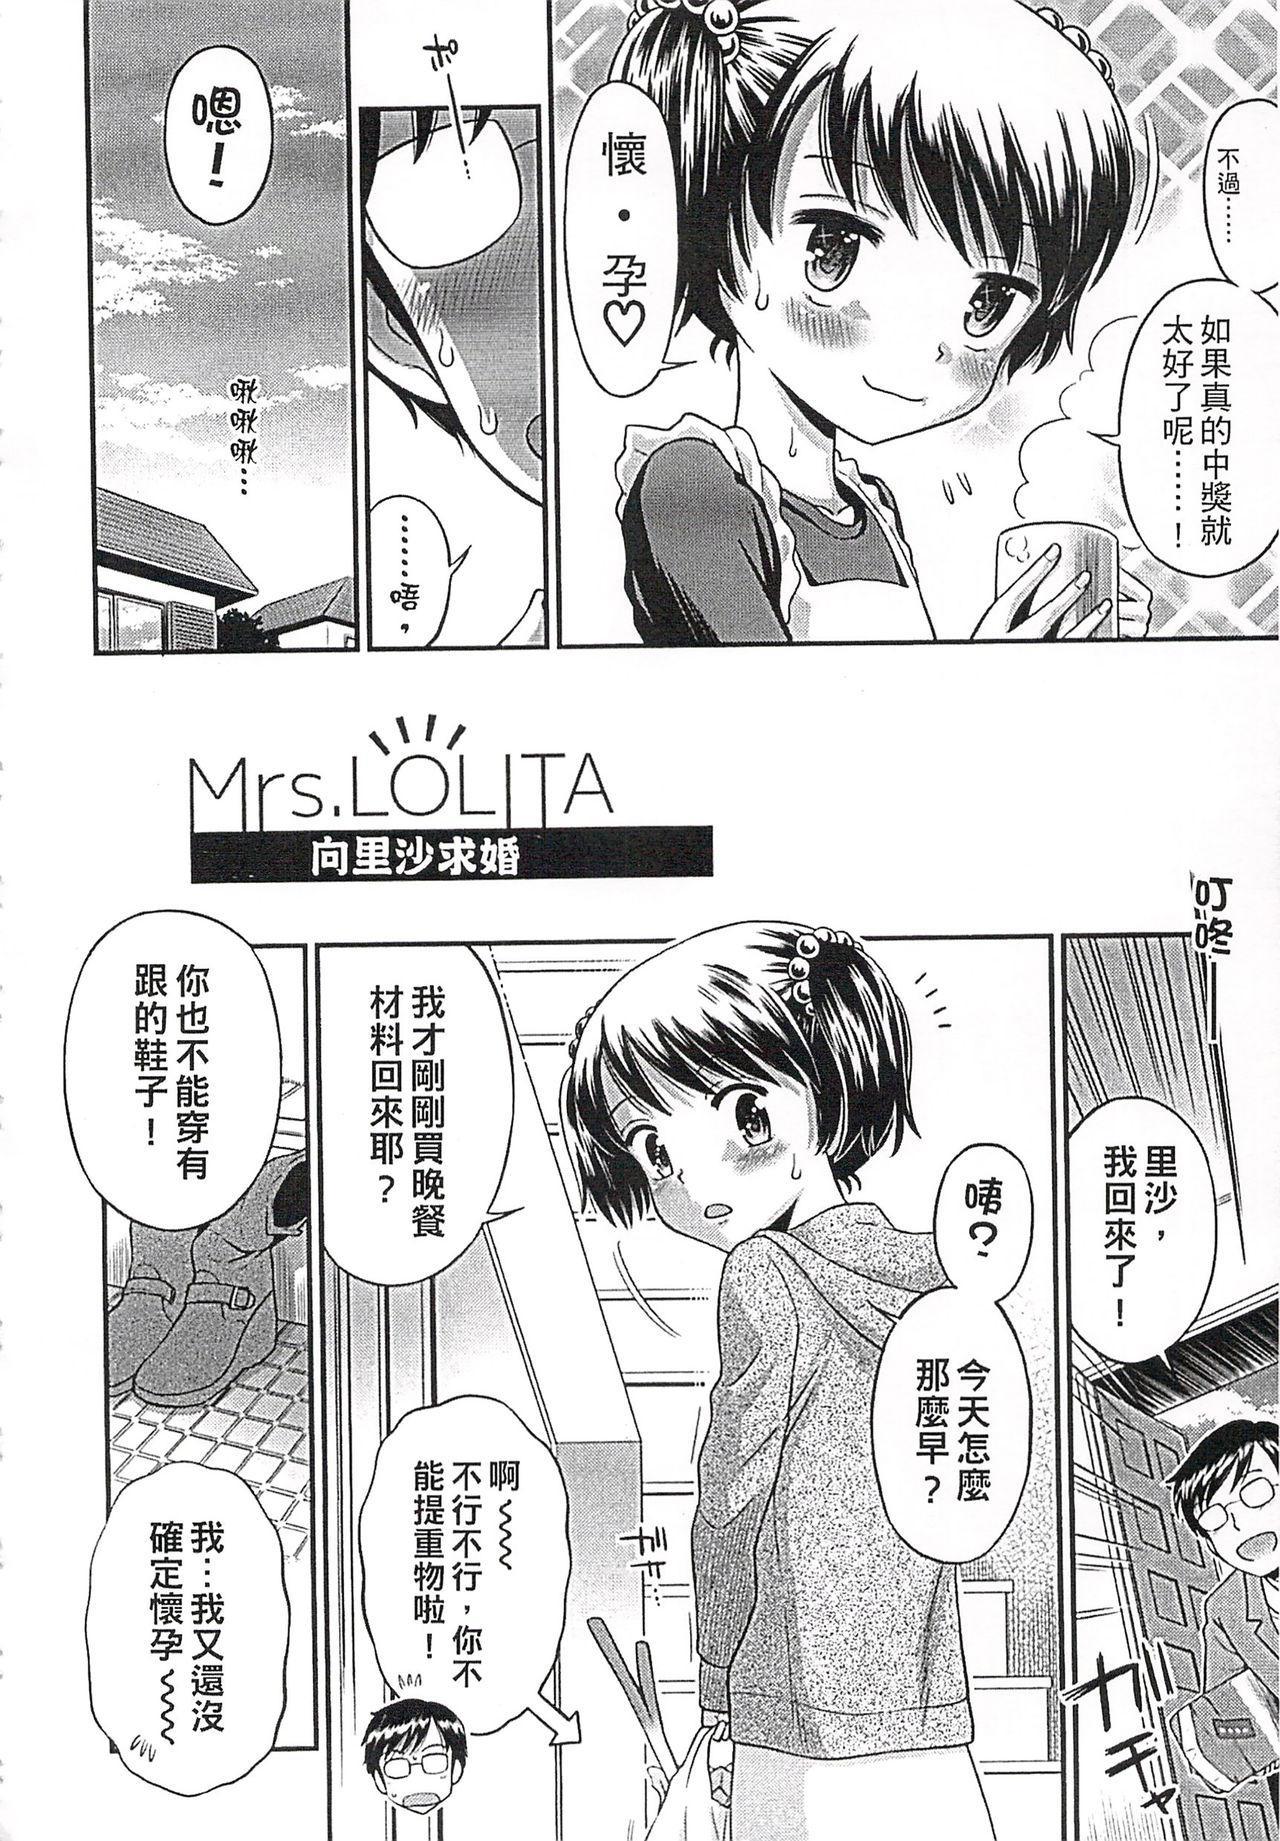 Kore demo Otona Desu Kedo!? Mrs.LOLITA Kanzenban   人家是大人啦! ~Mrs.LOLITA完全版 209